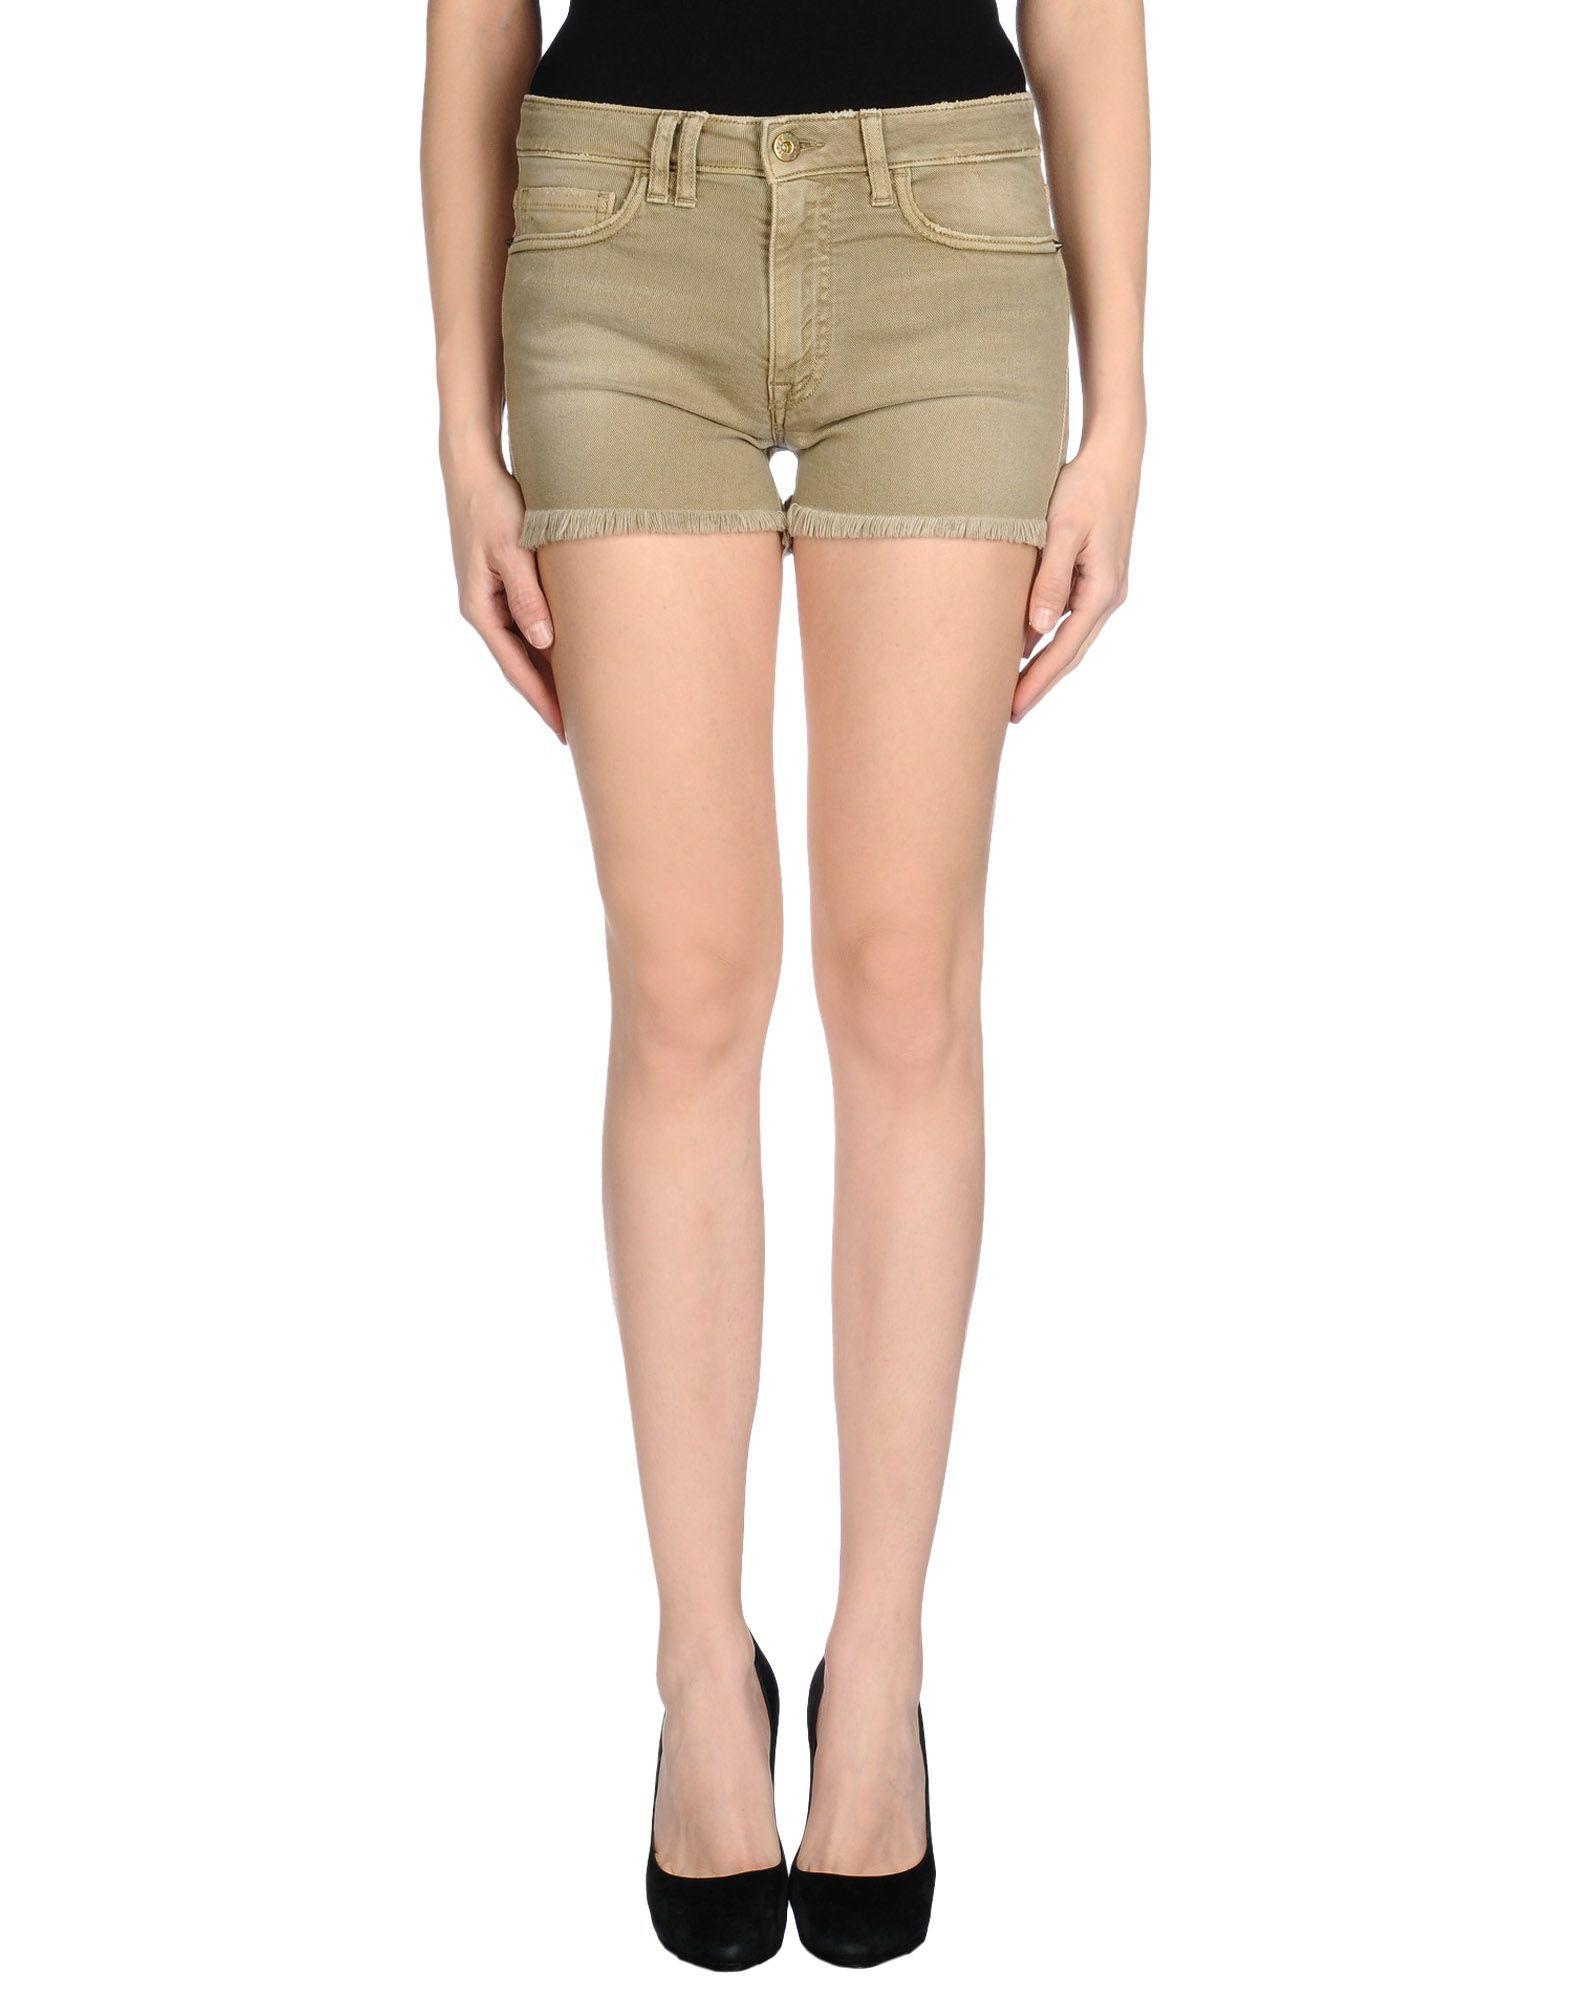 Cycle Military Green Denim Shorts